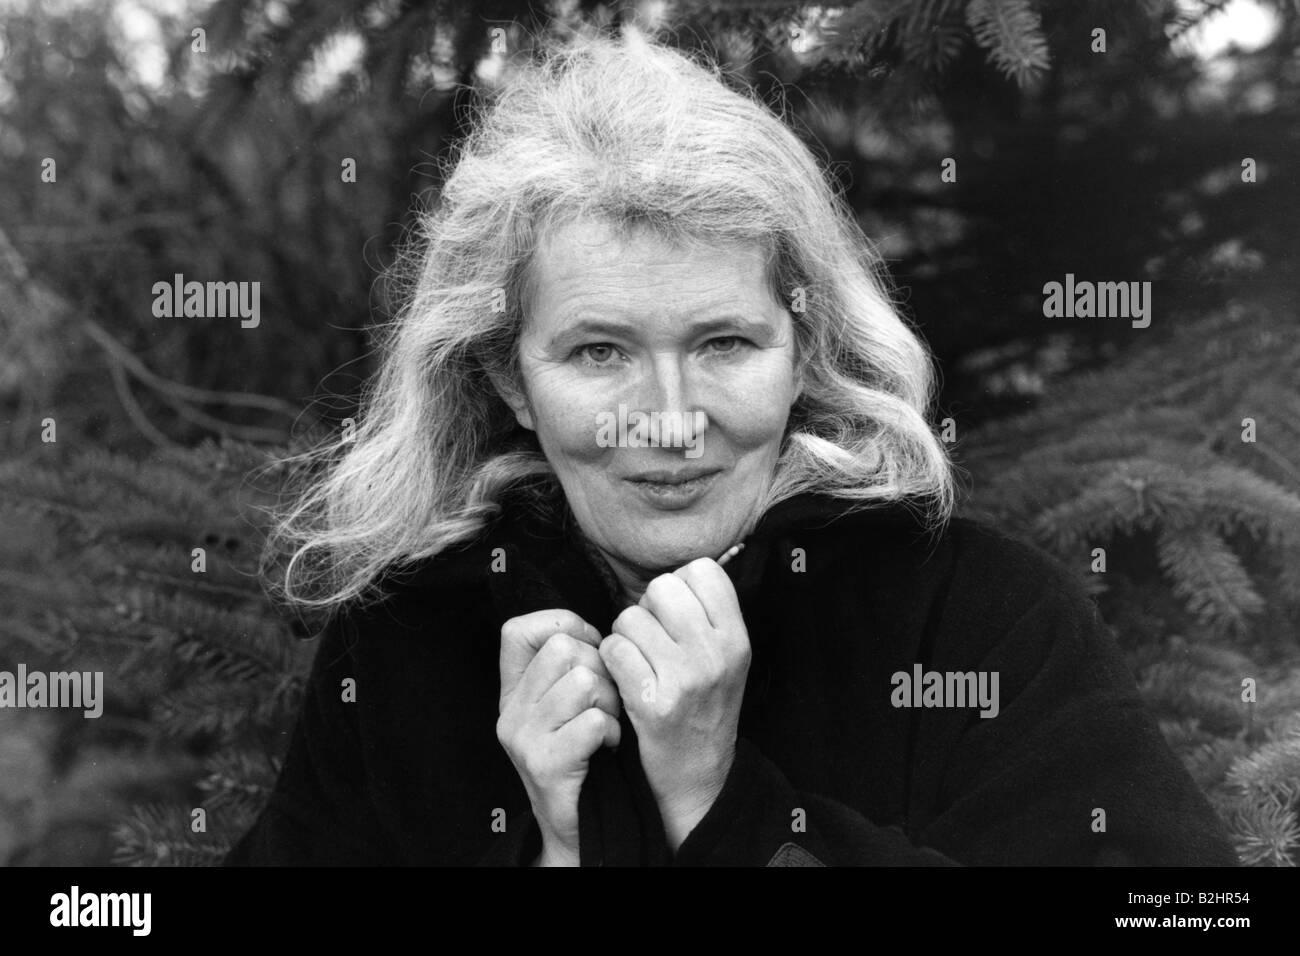 Carter, Angela, (birth name Angela Olive Stalker), 7.5.1940 - 16.2.1992, British author / writer, portrait, 1984, - Stock Image